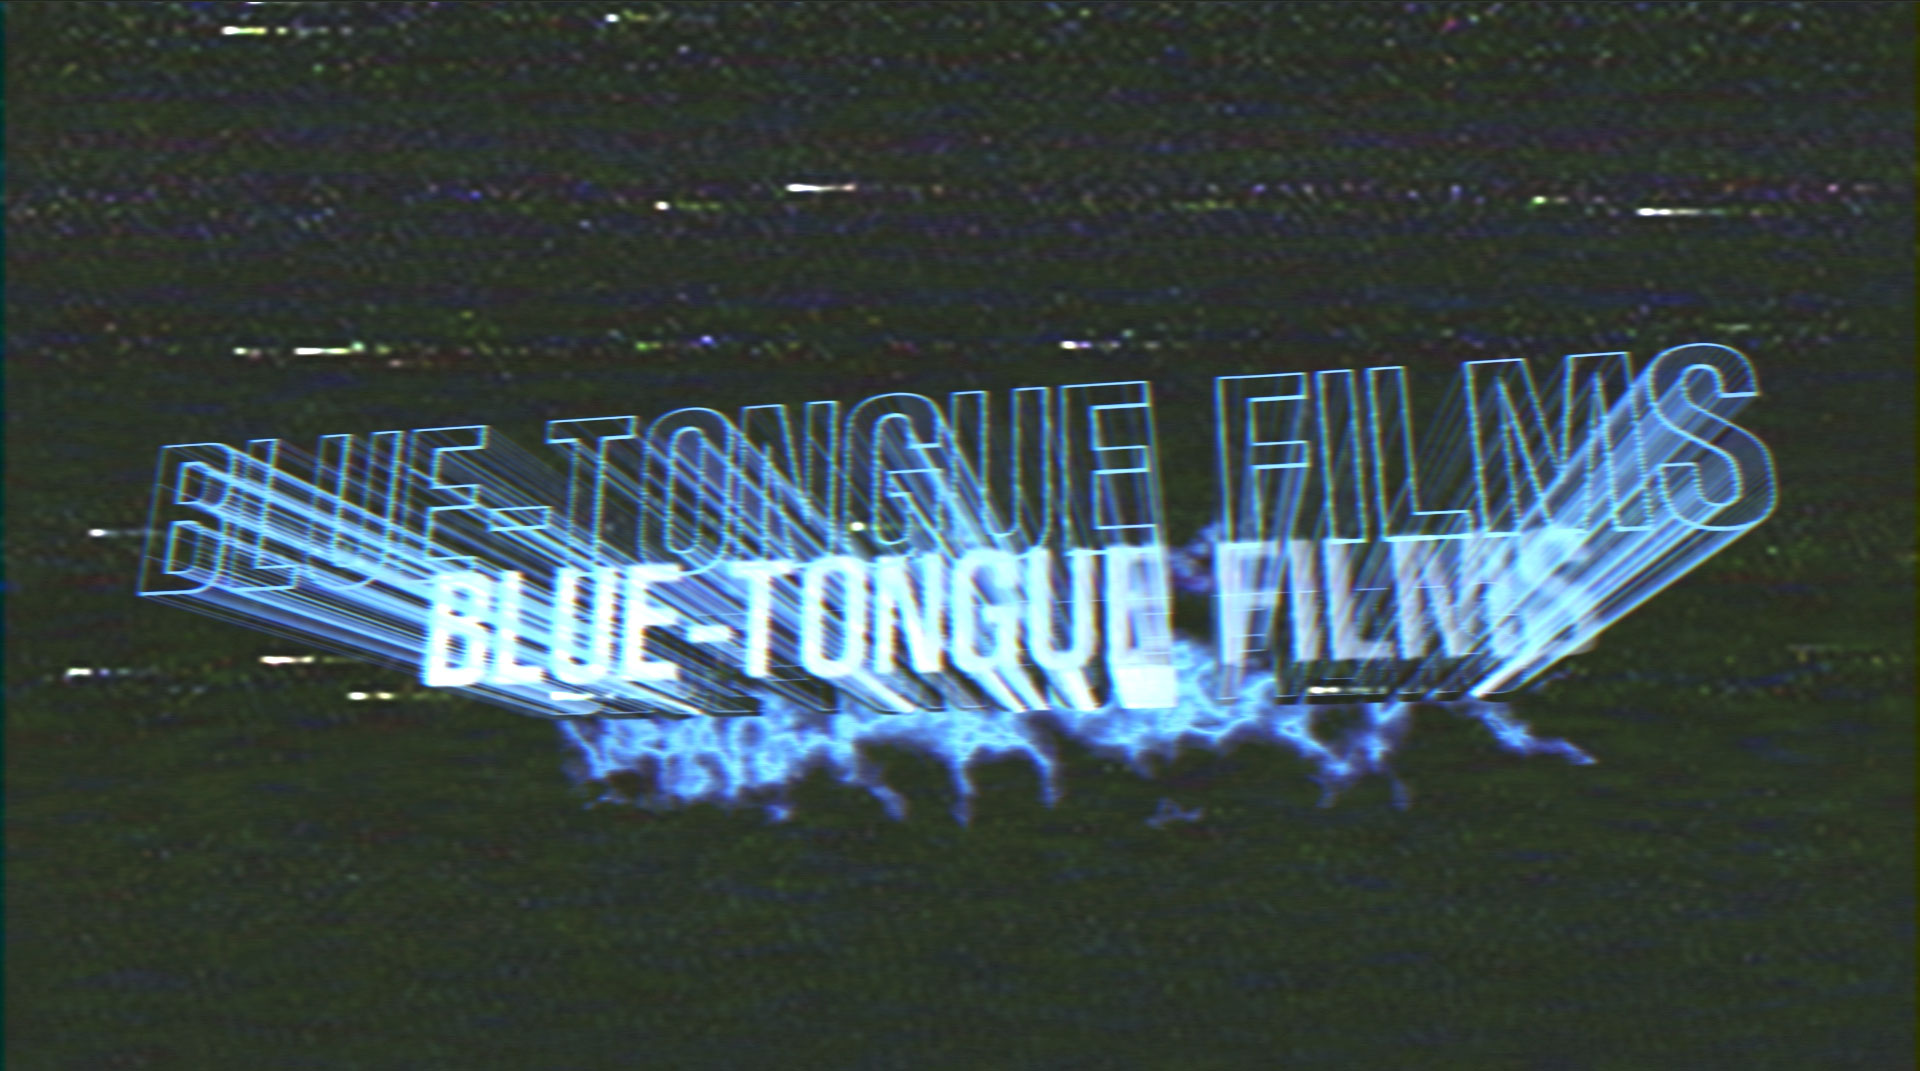 Blue Tongue Films identity